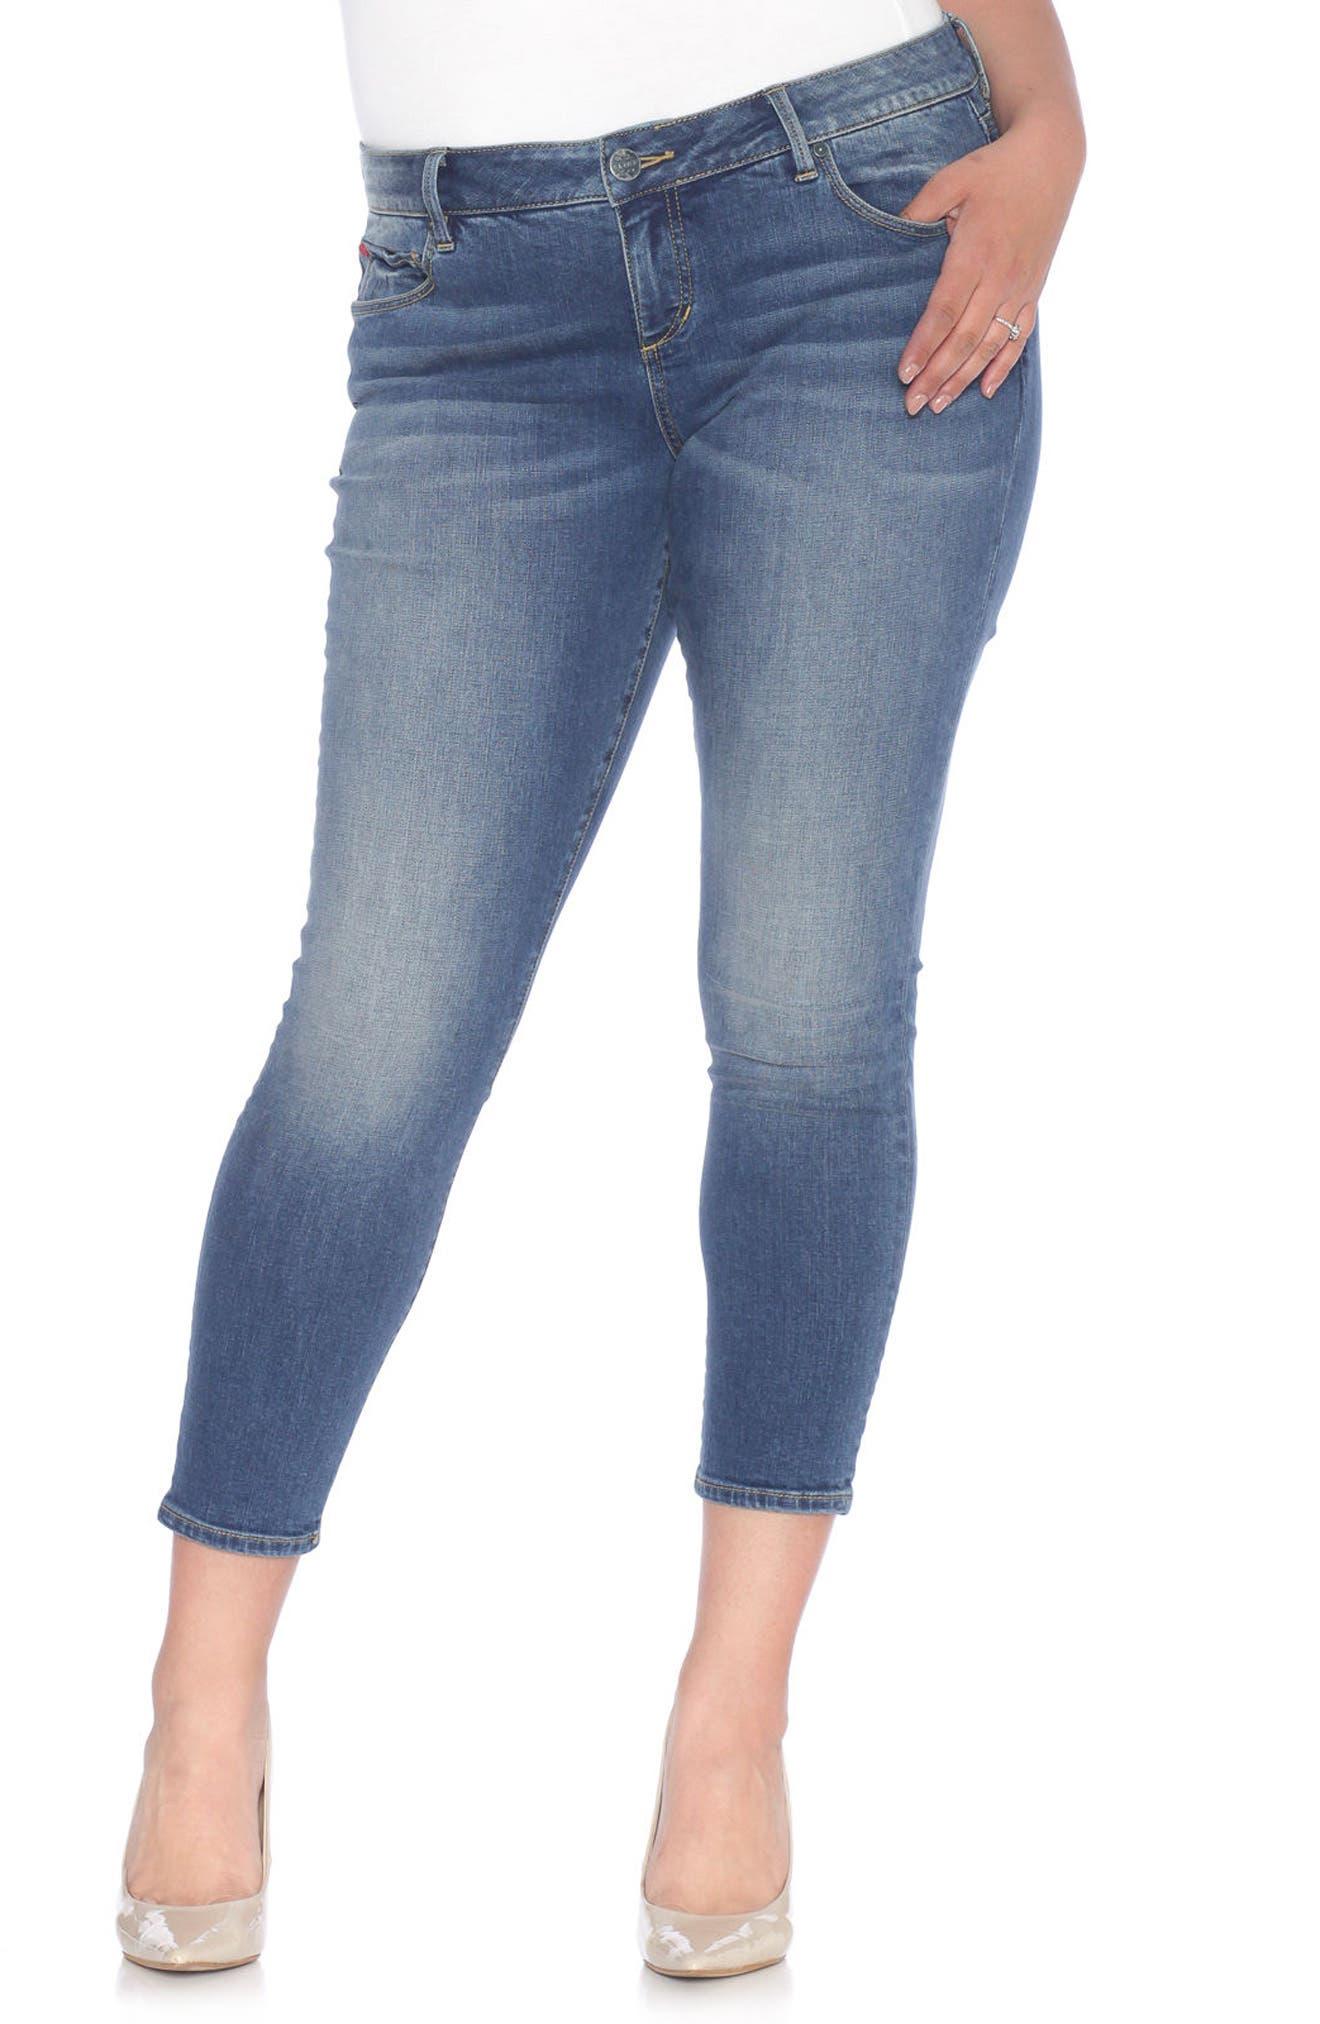 SLINK Jeans Skinny Ankle Jeans (Plus Size)